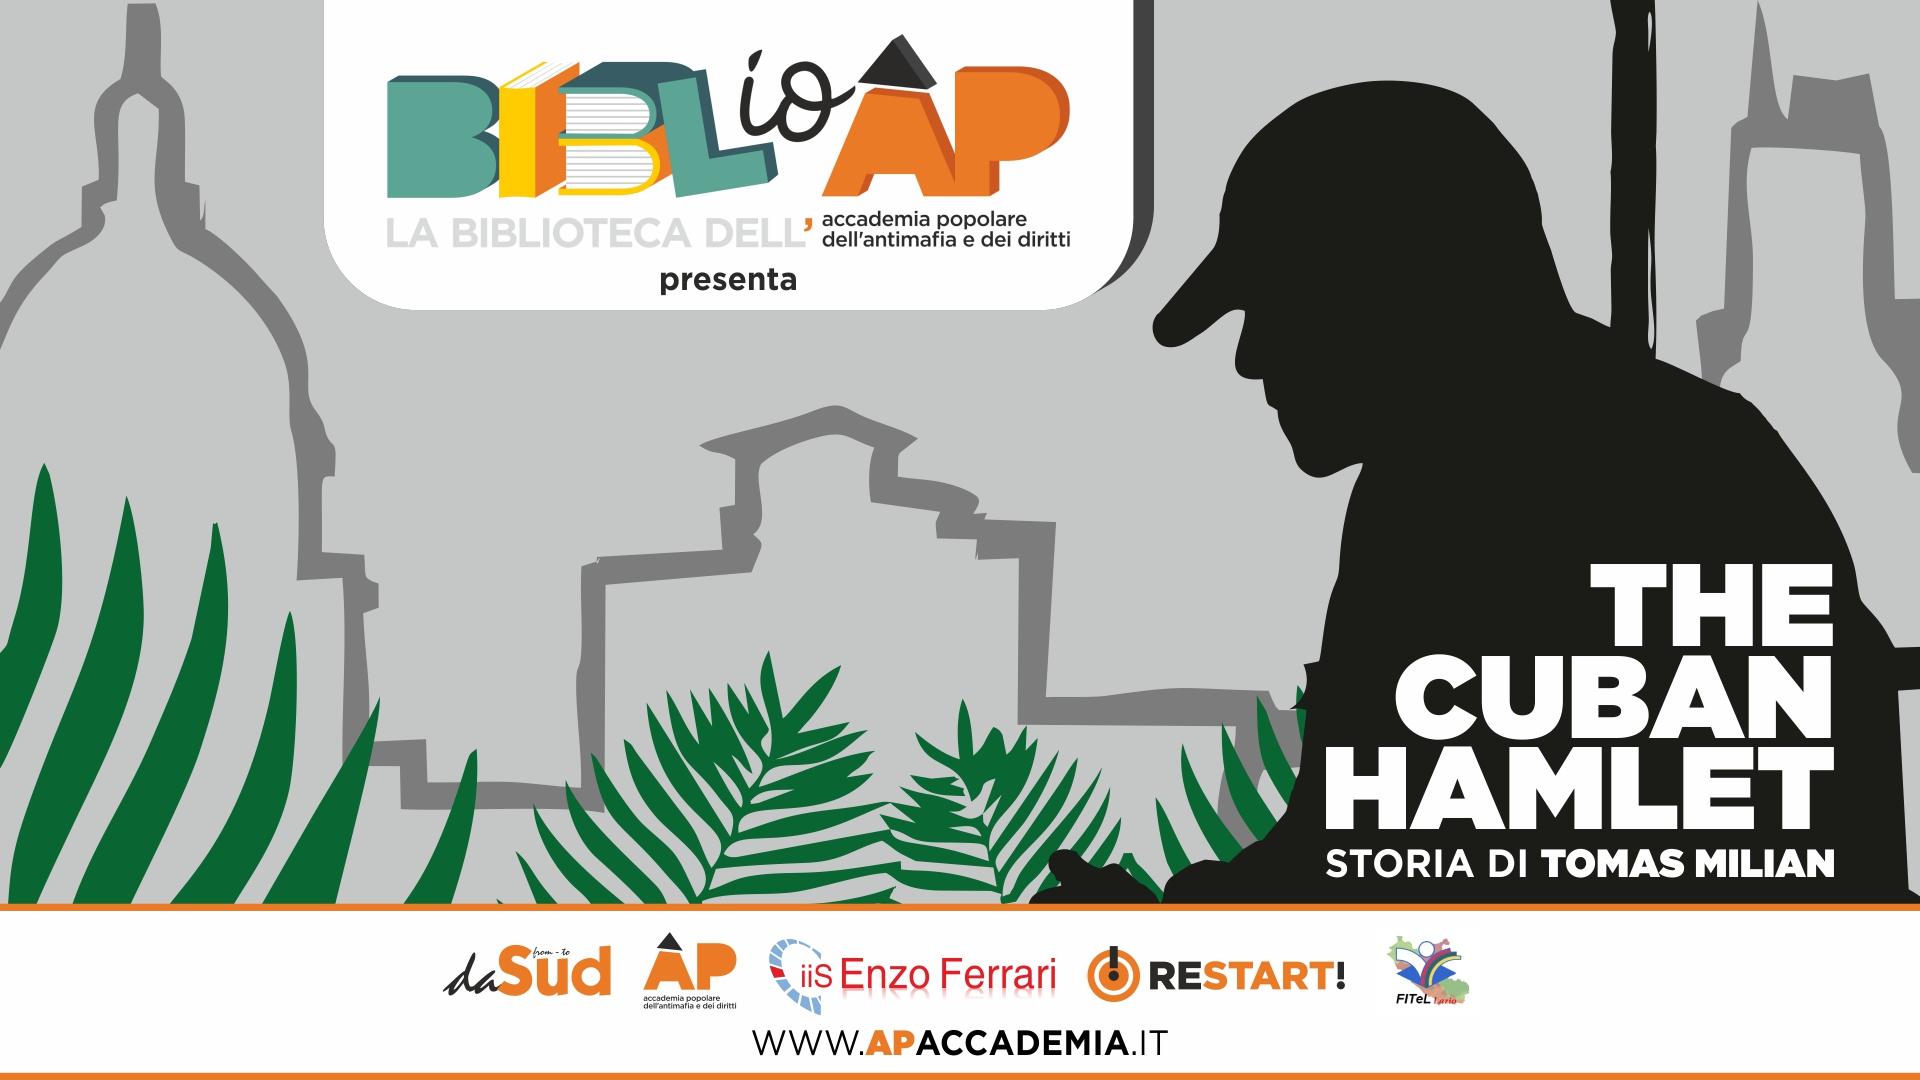 biblioàp_the cuban hamlet_cover